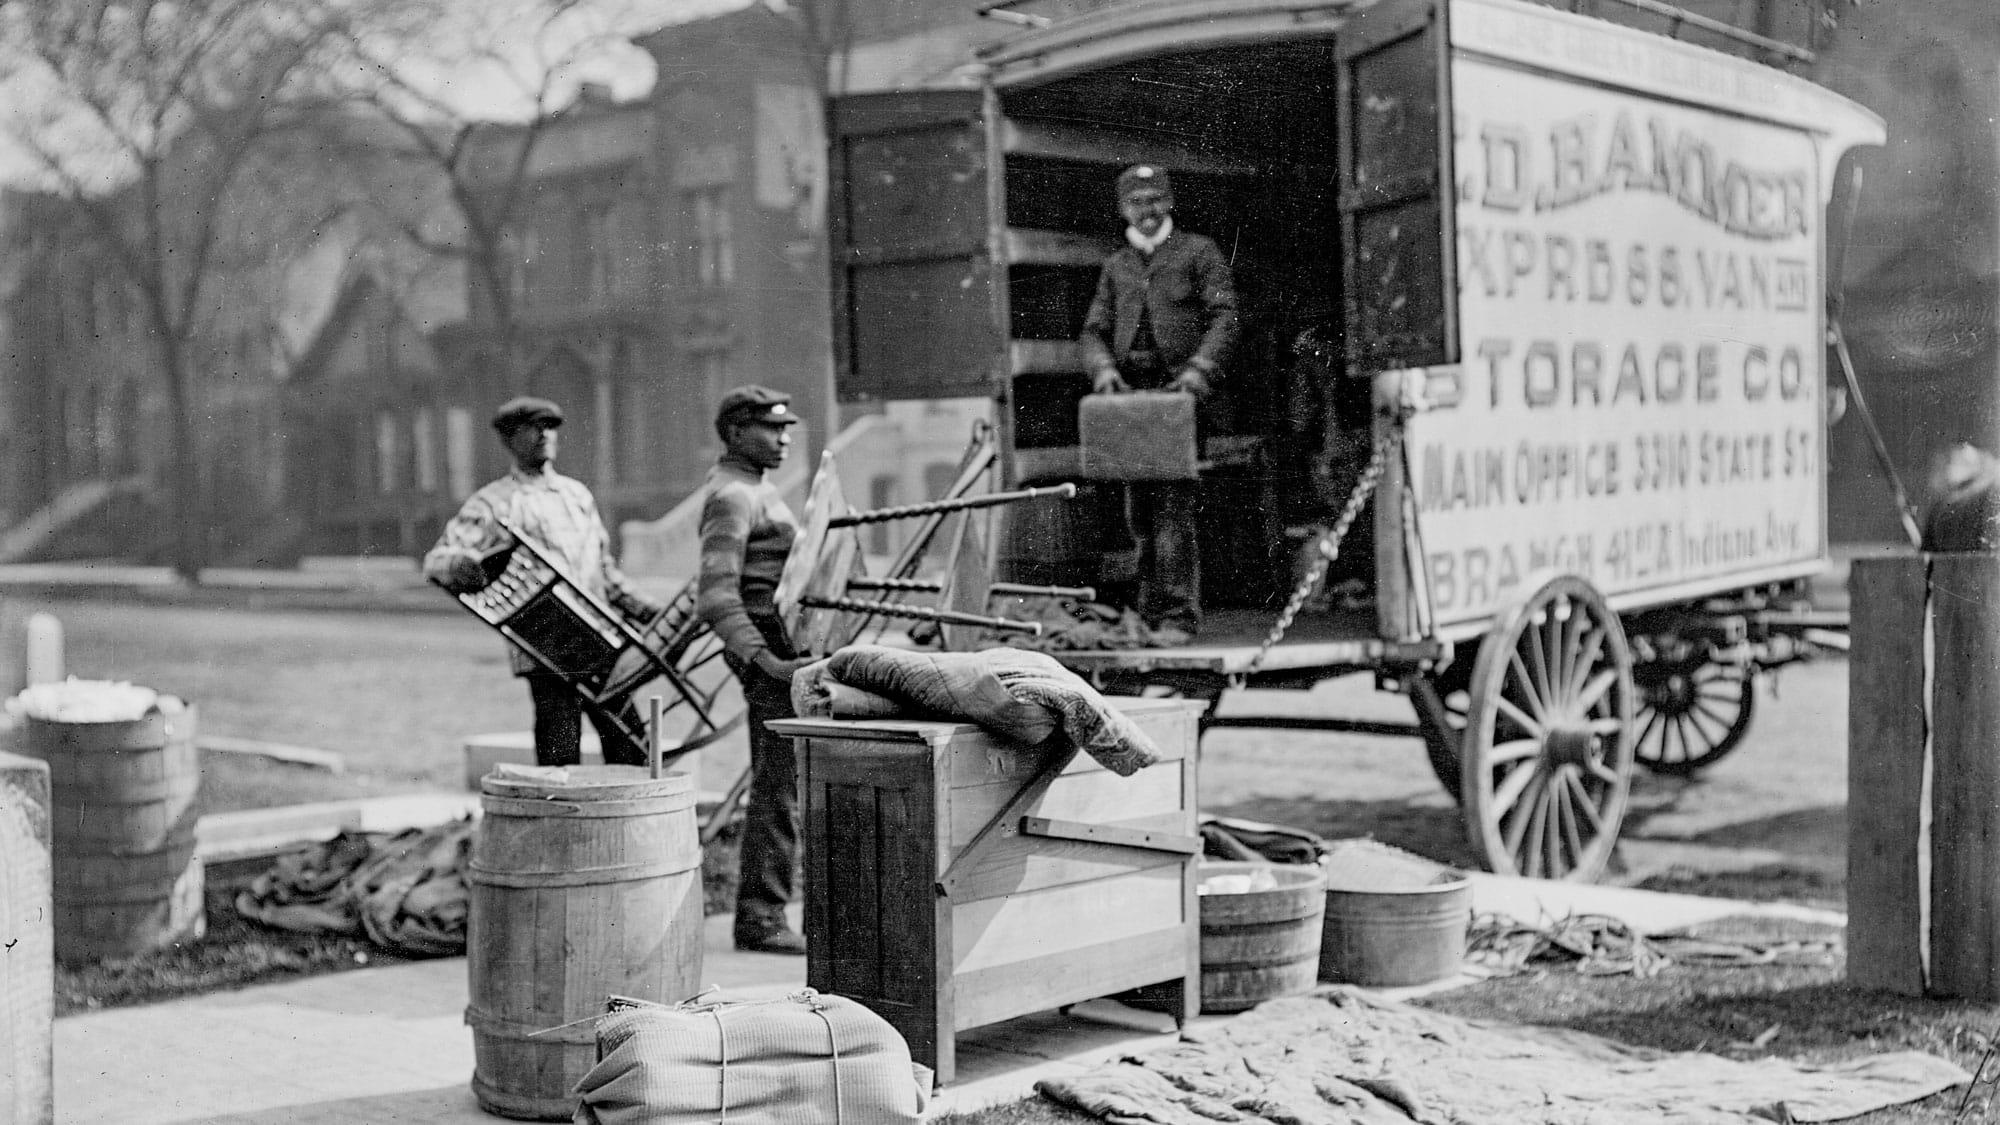 Black men loading goods on a horse-drawn moving van